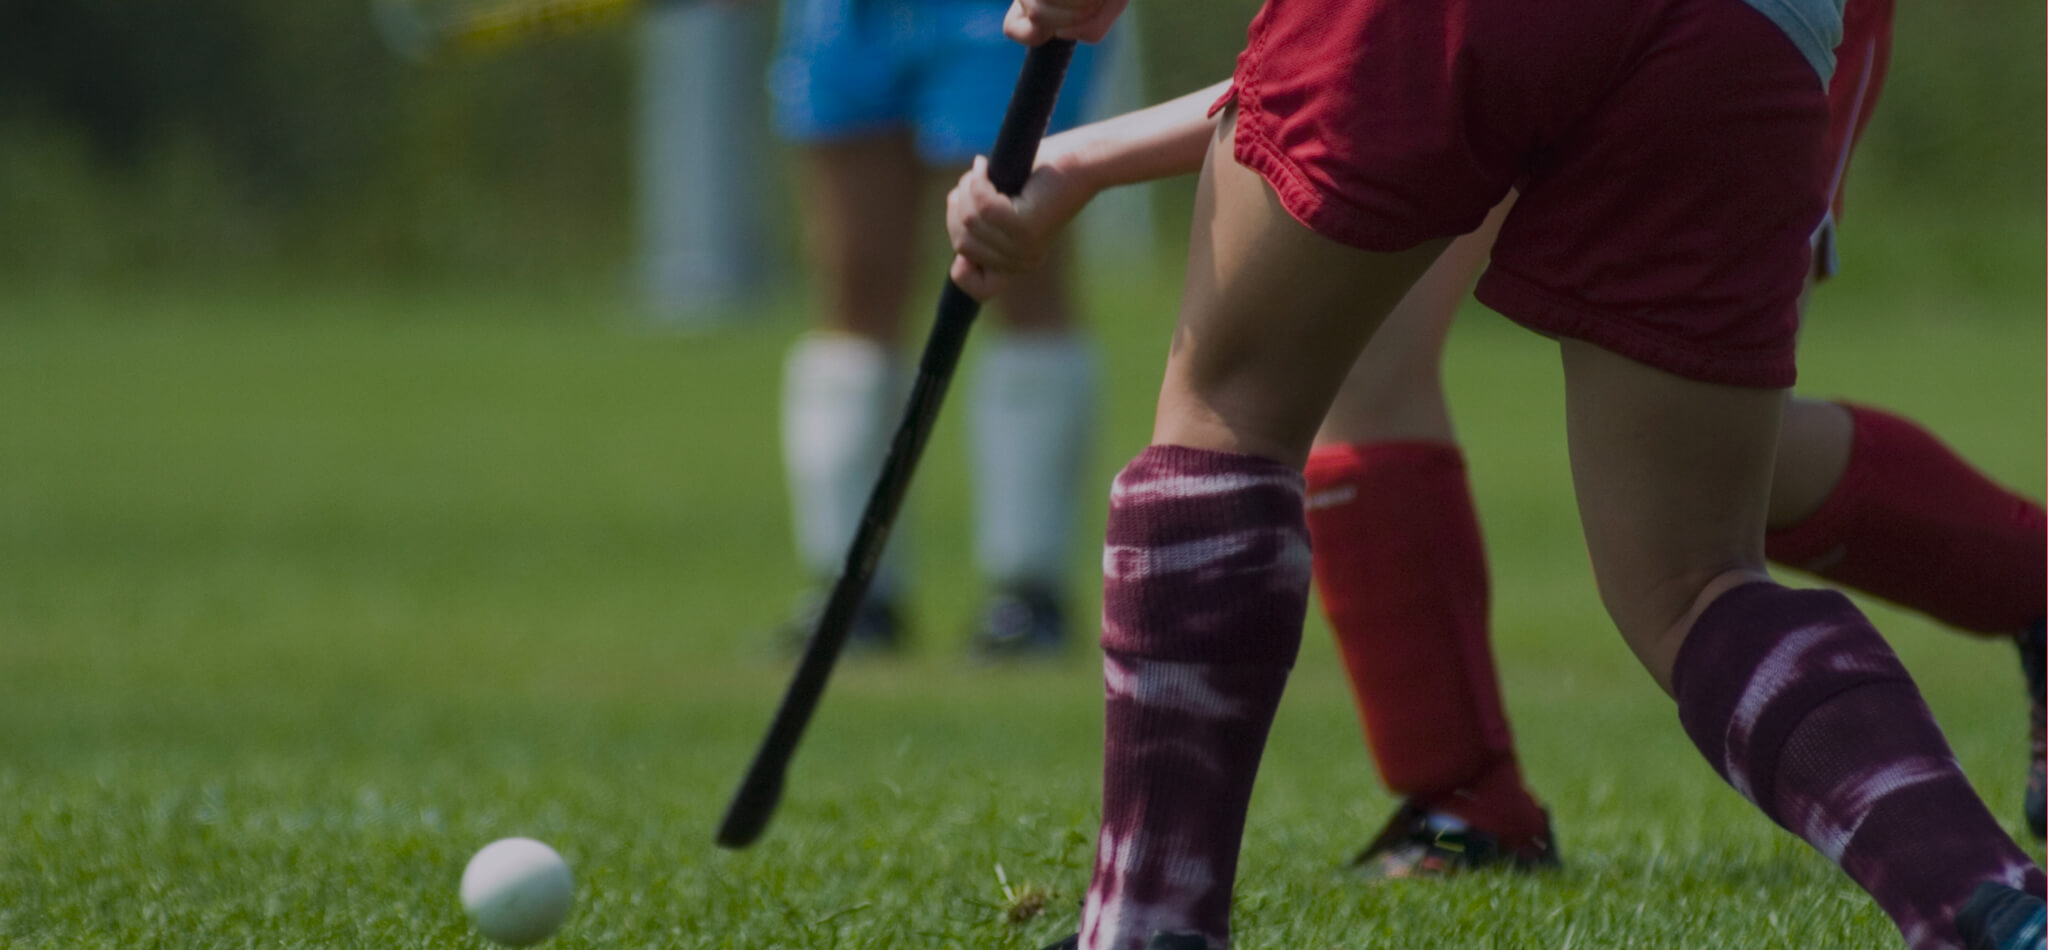 MomClone-Field-hockey-Team-Tool-intro-video-app